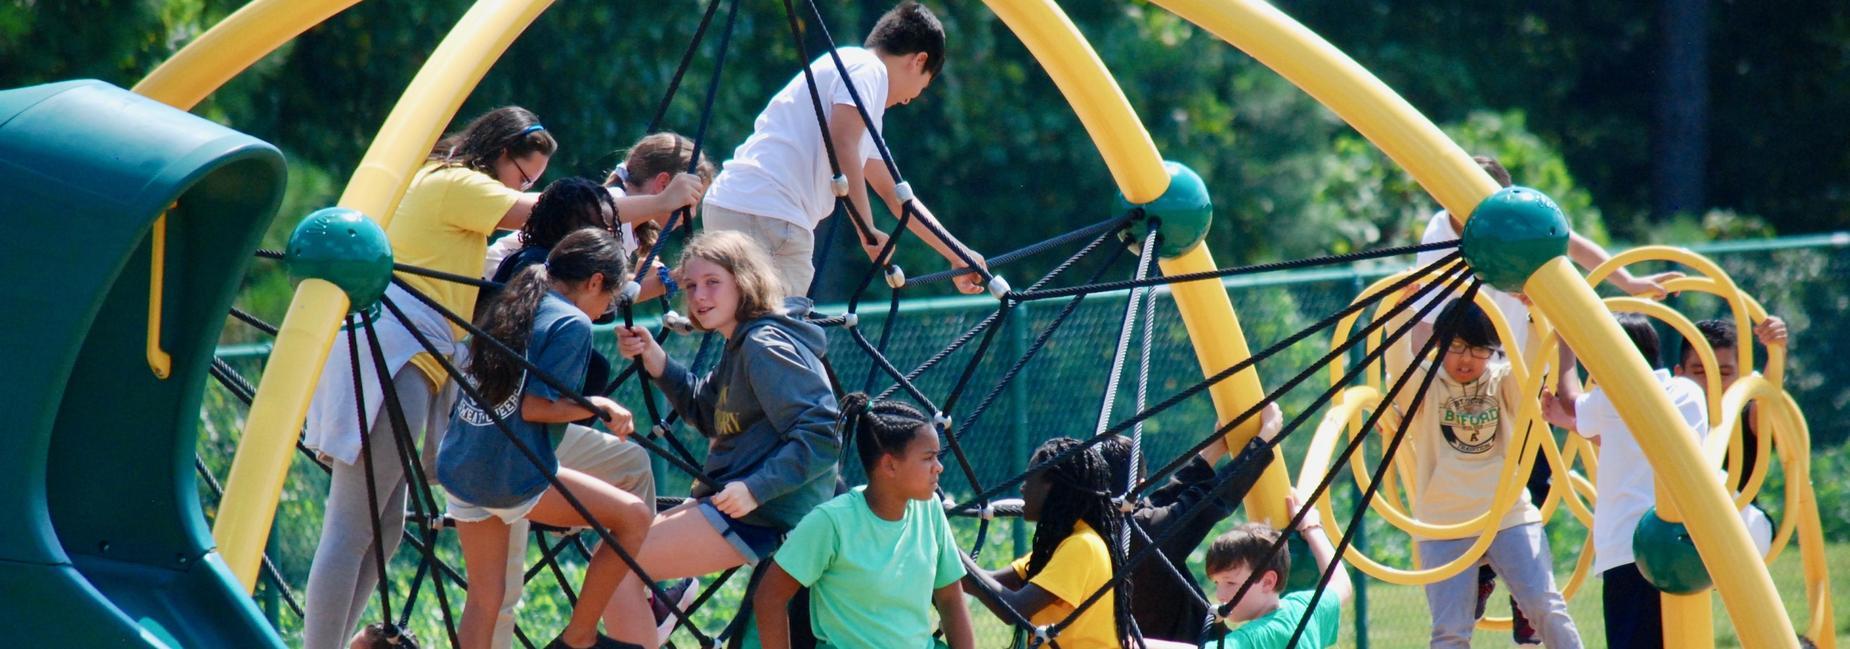 BSA Playground